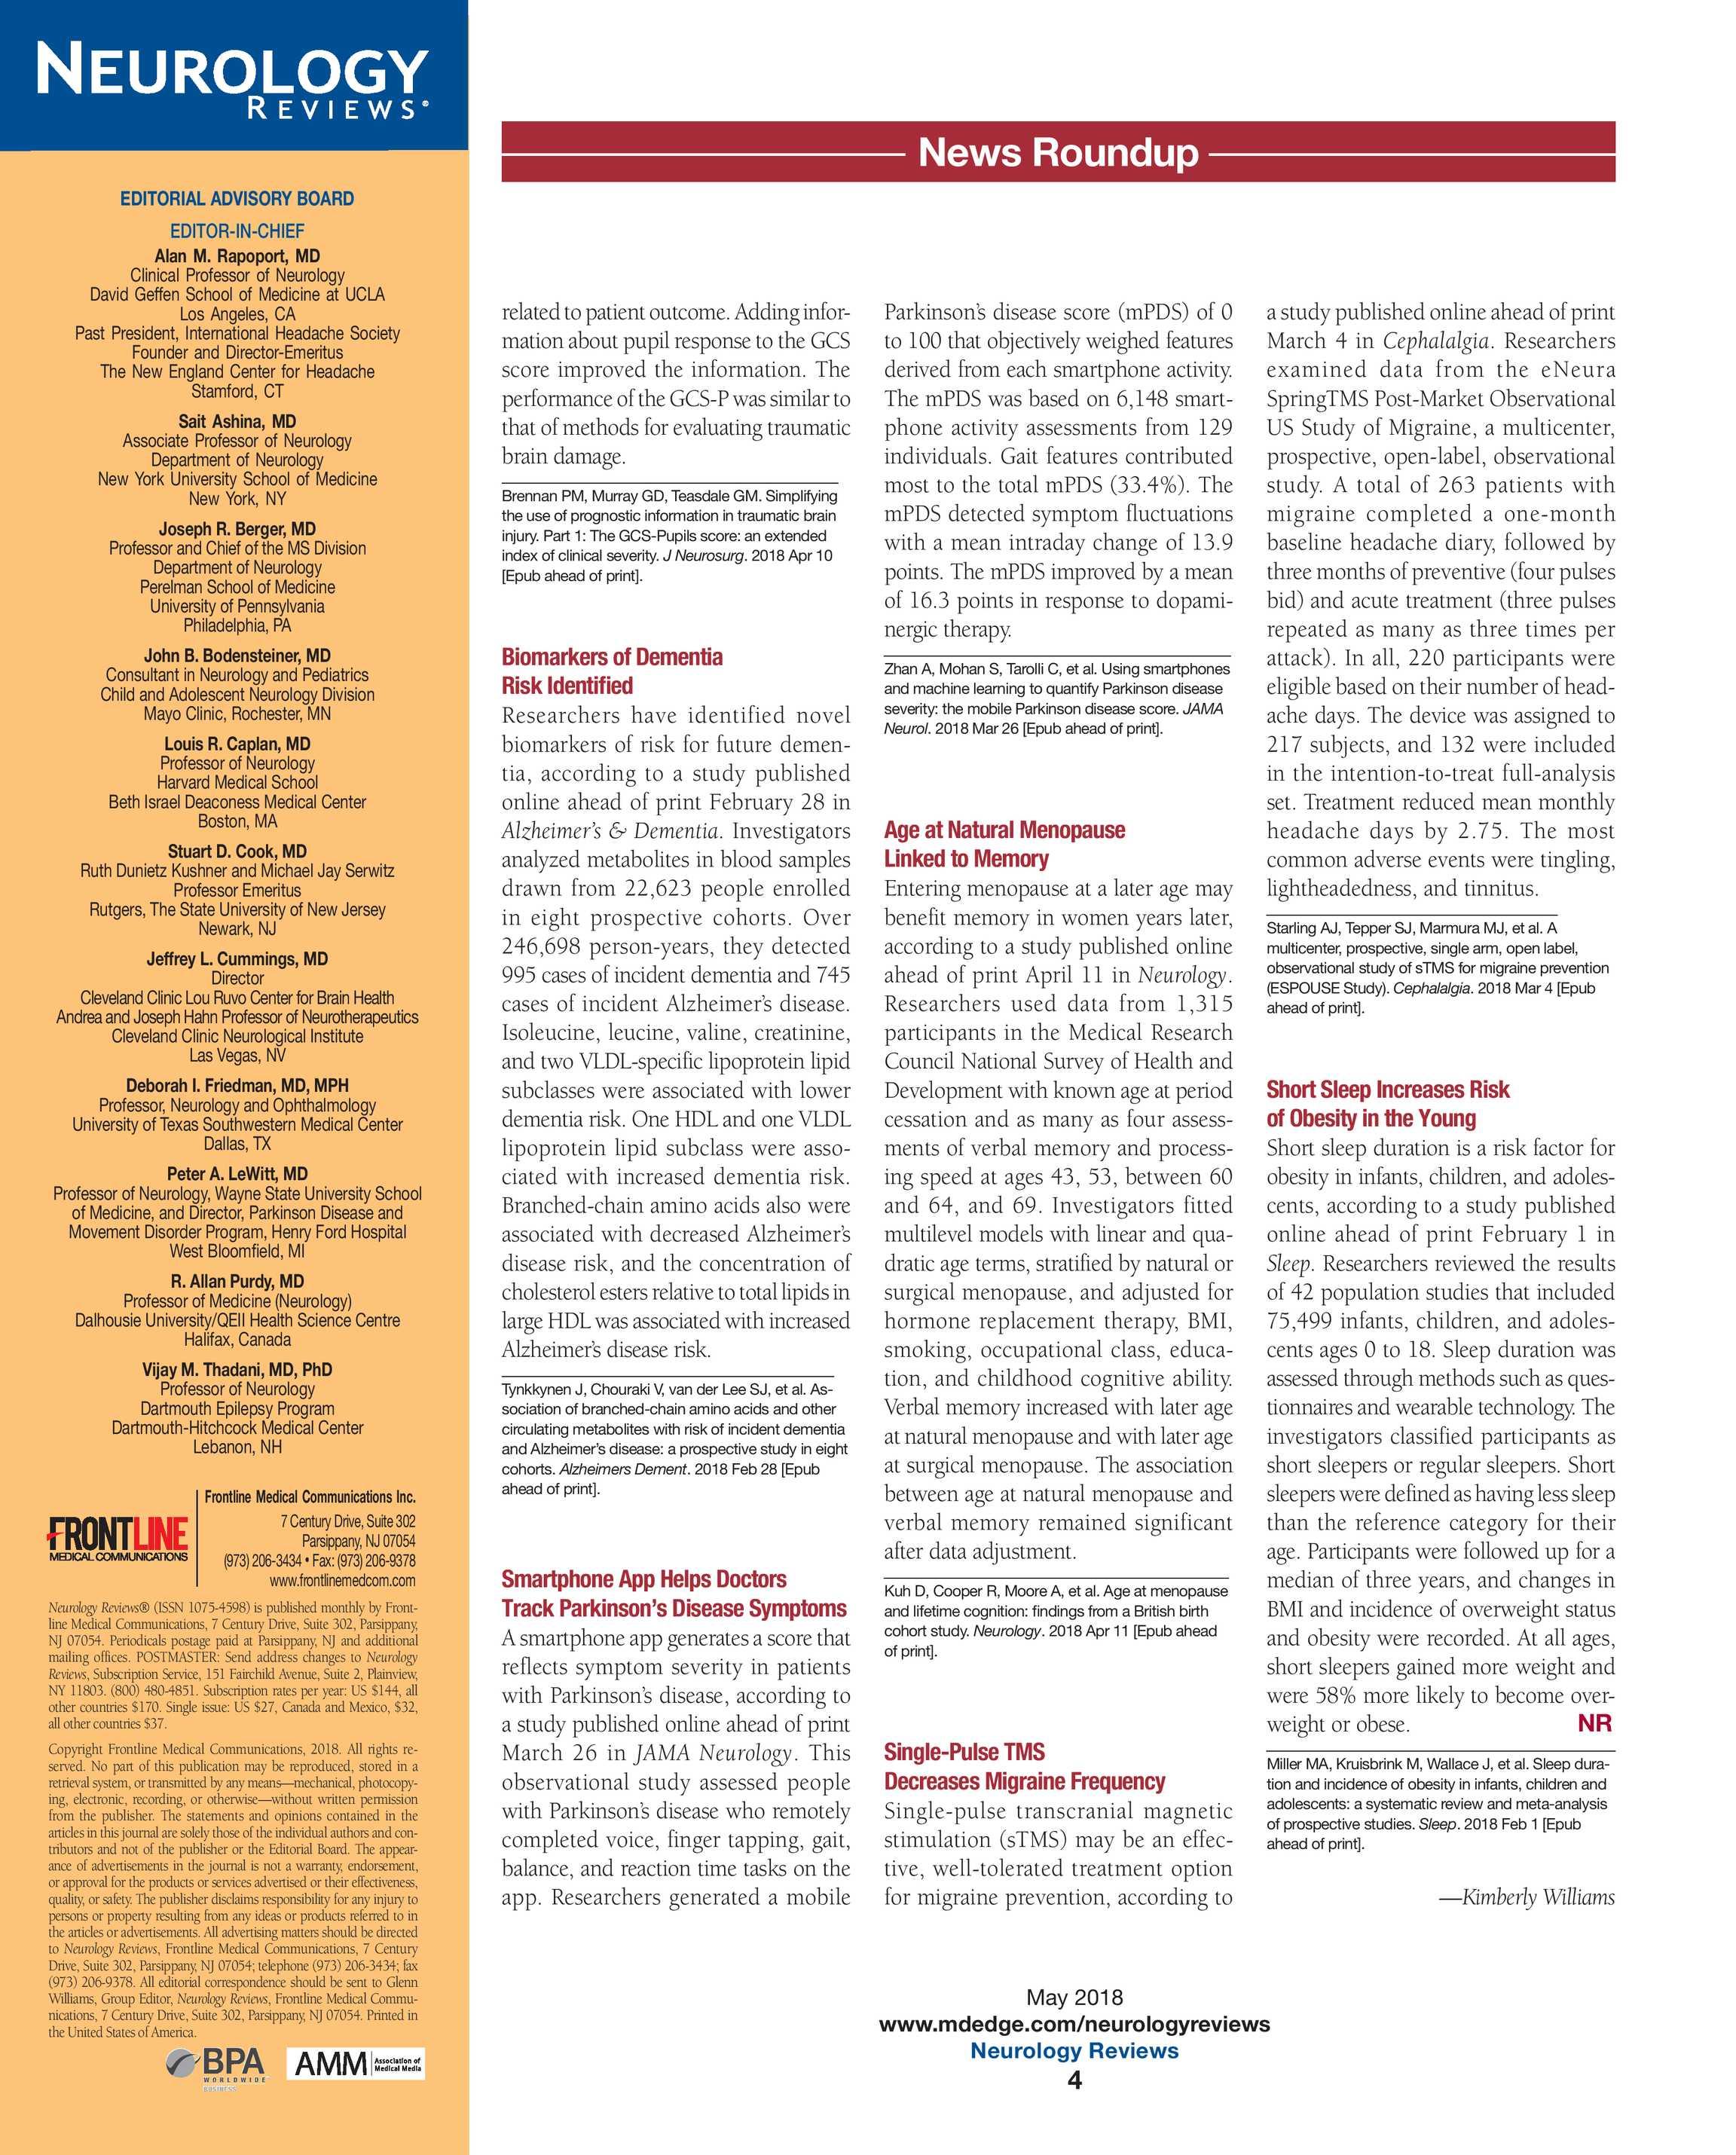 Neurology Reviews - NR MAY 2018 - page 4